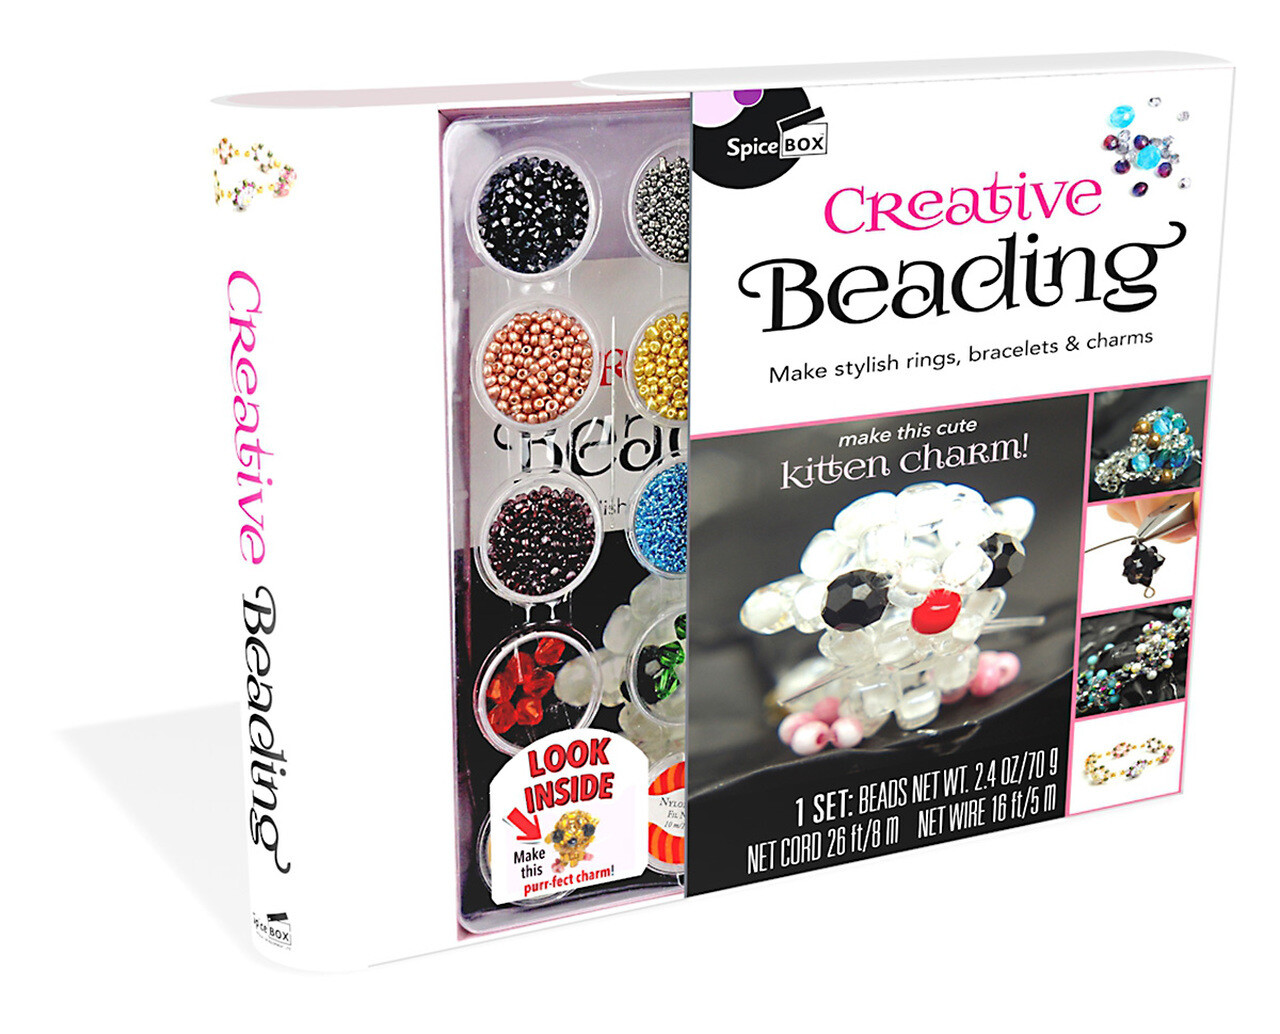 Spice Box; Creative Beading